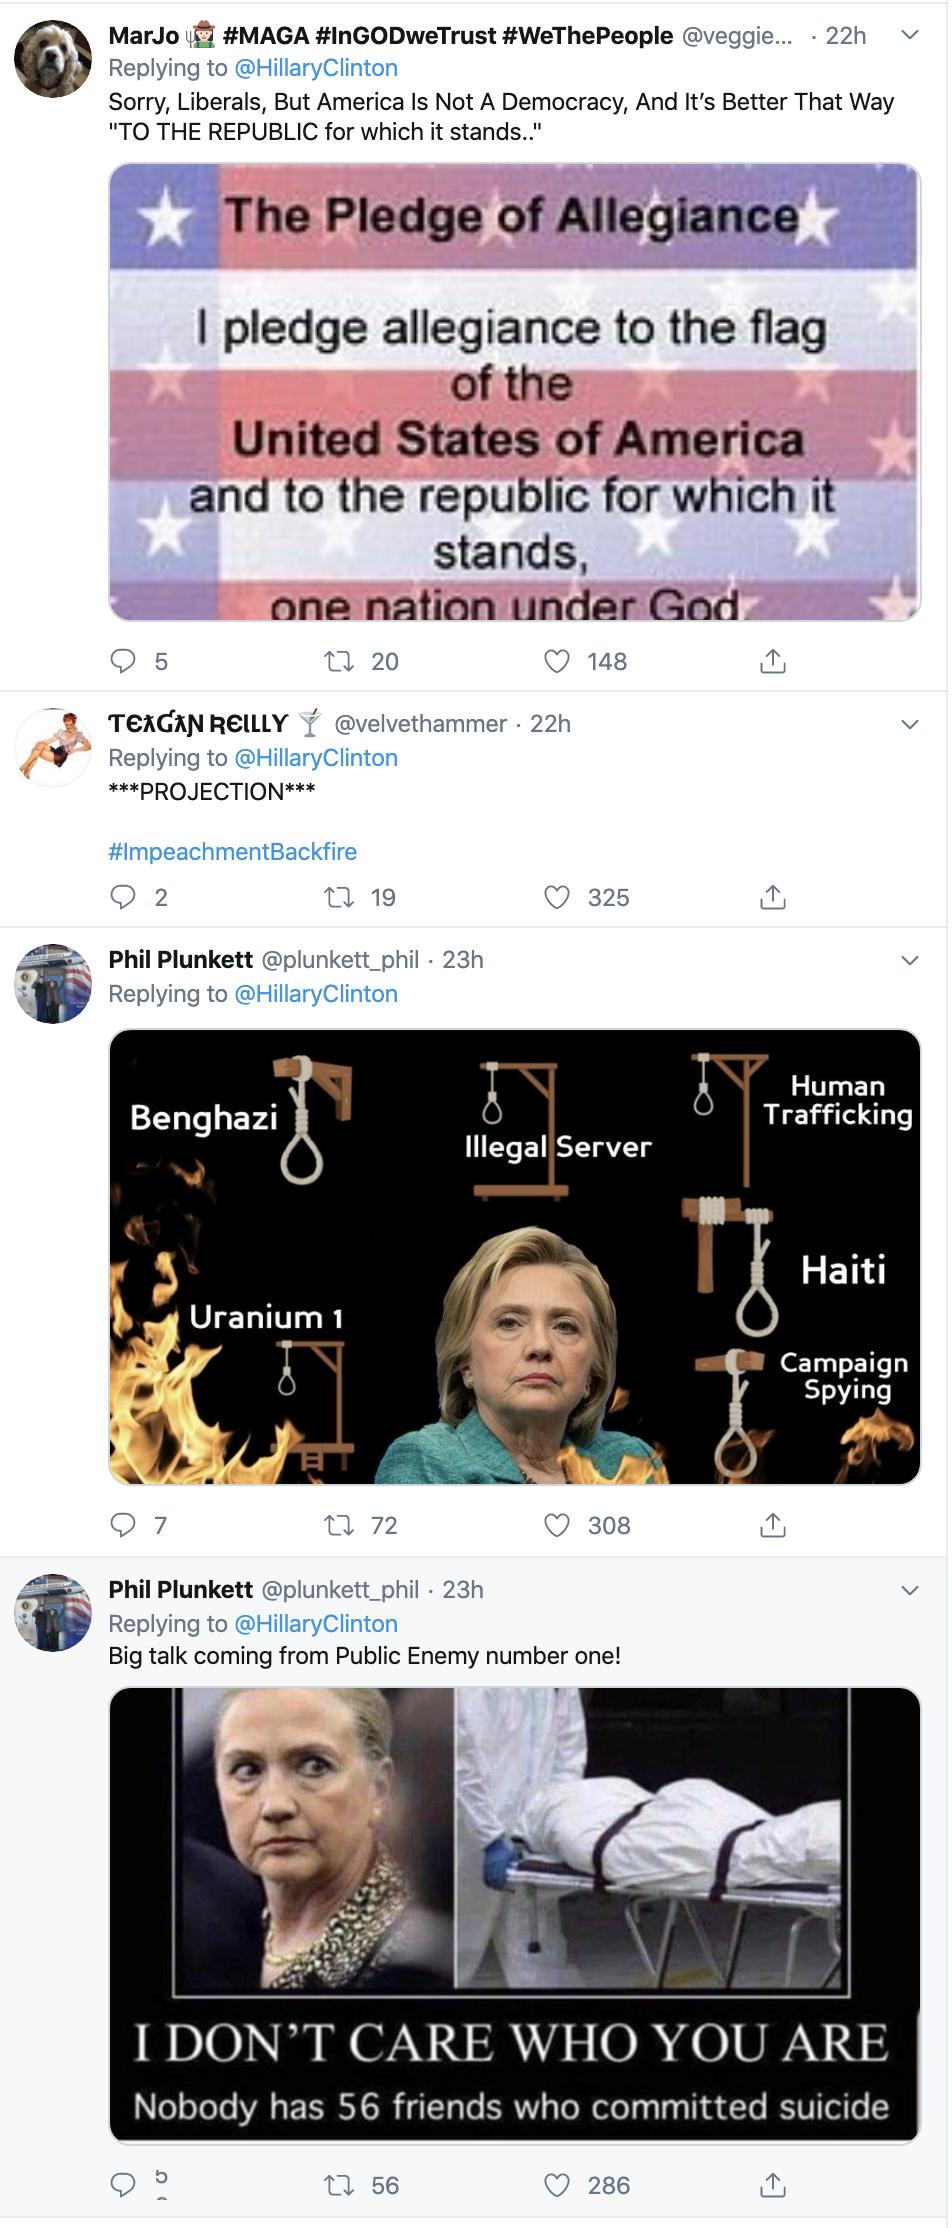 Screen-Shot-2019-12-11-at-9.13.35-AM Clinton Embarrasses Trump With Impeachment Tweet Trolling Featured Hillary Clinton Impeachment Politics